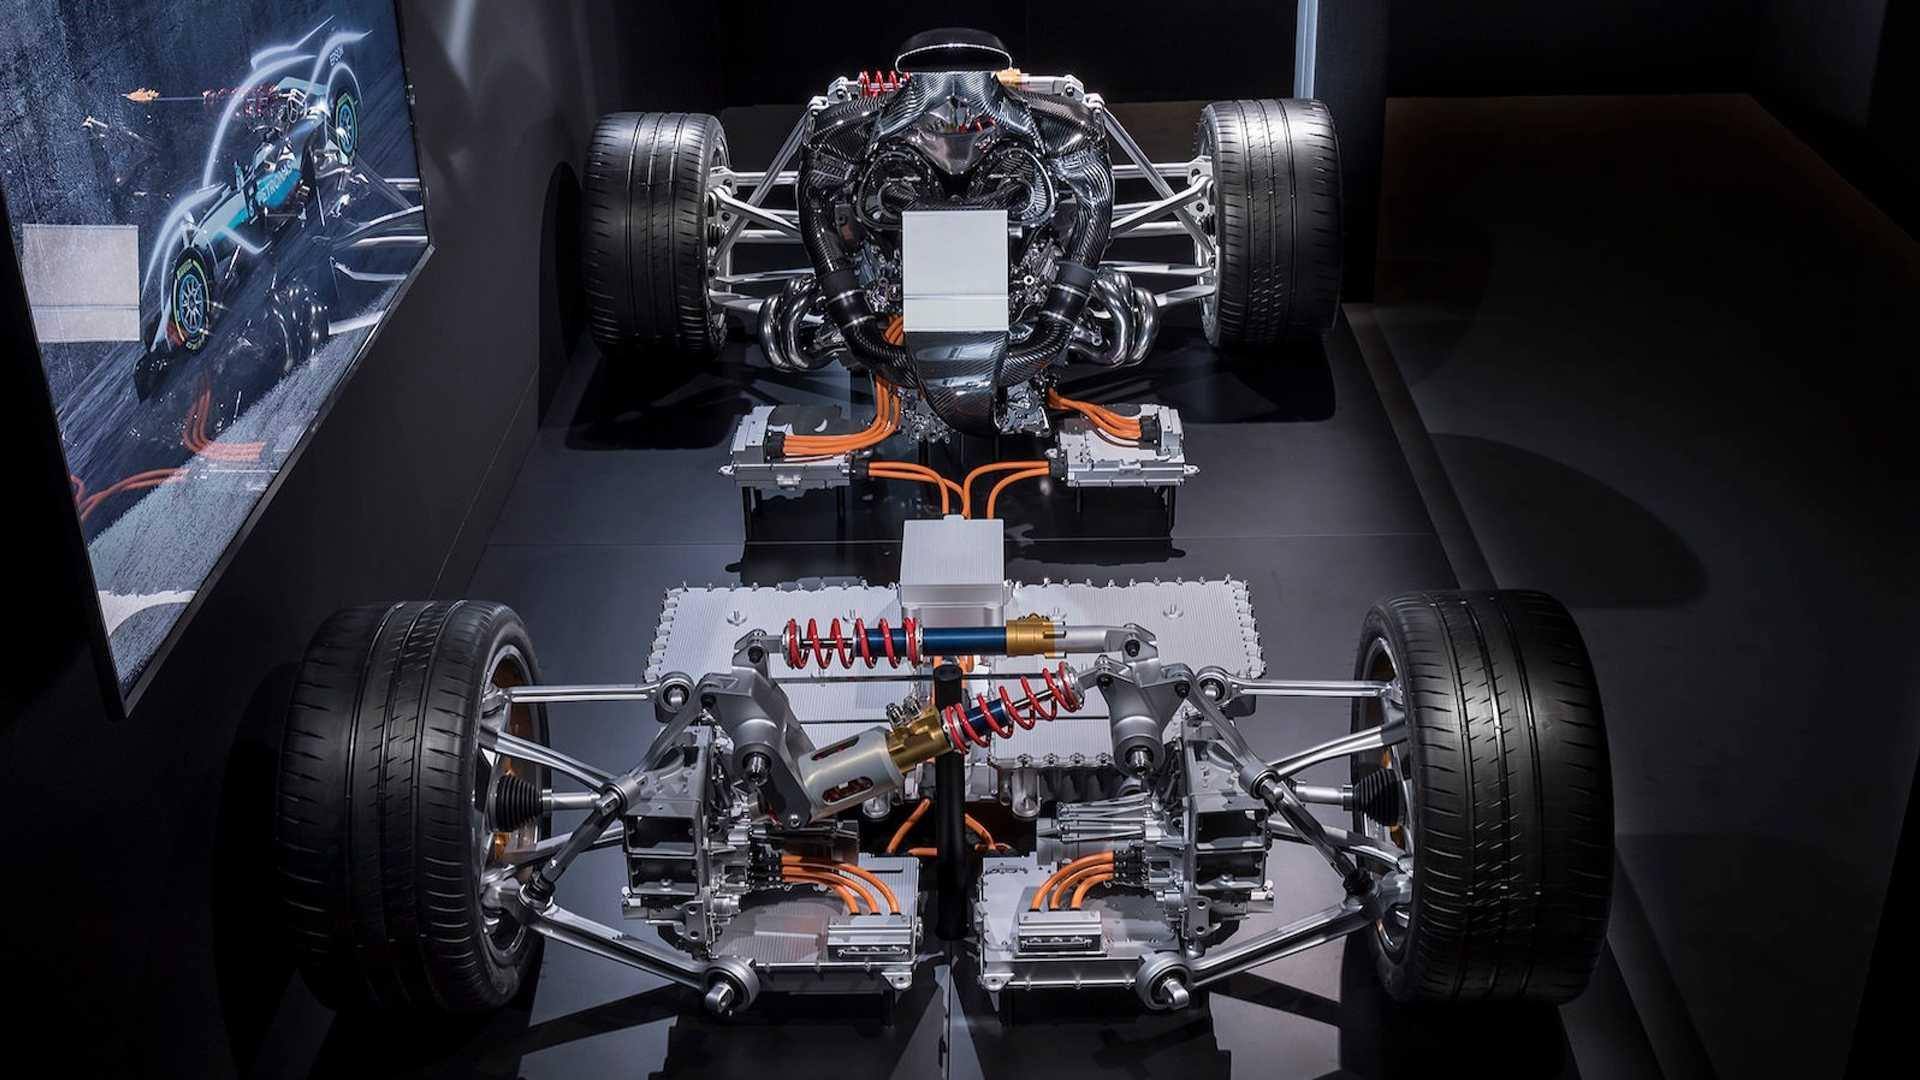 mercedes-amg-project-one-devoile-sa-mecanique-335-1.jpg